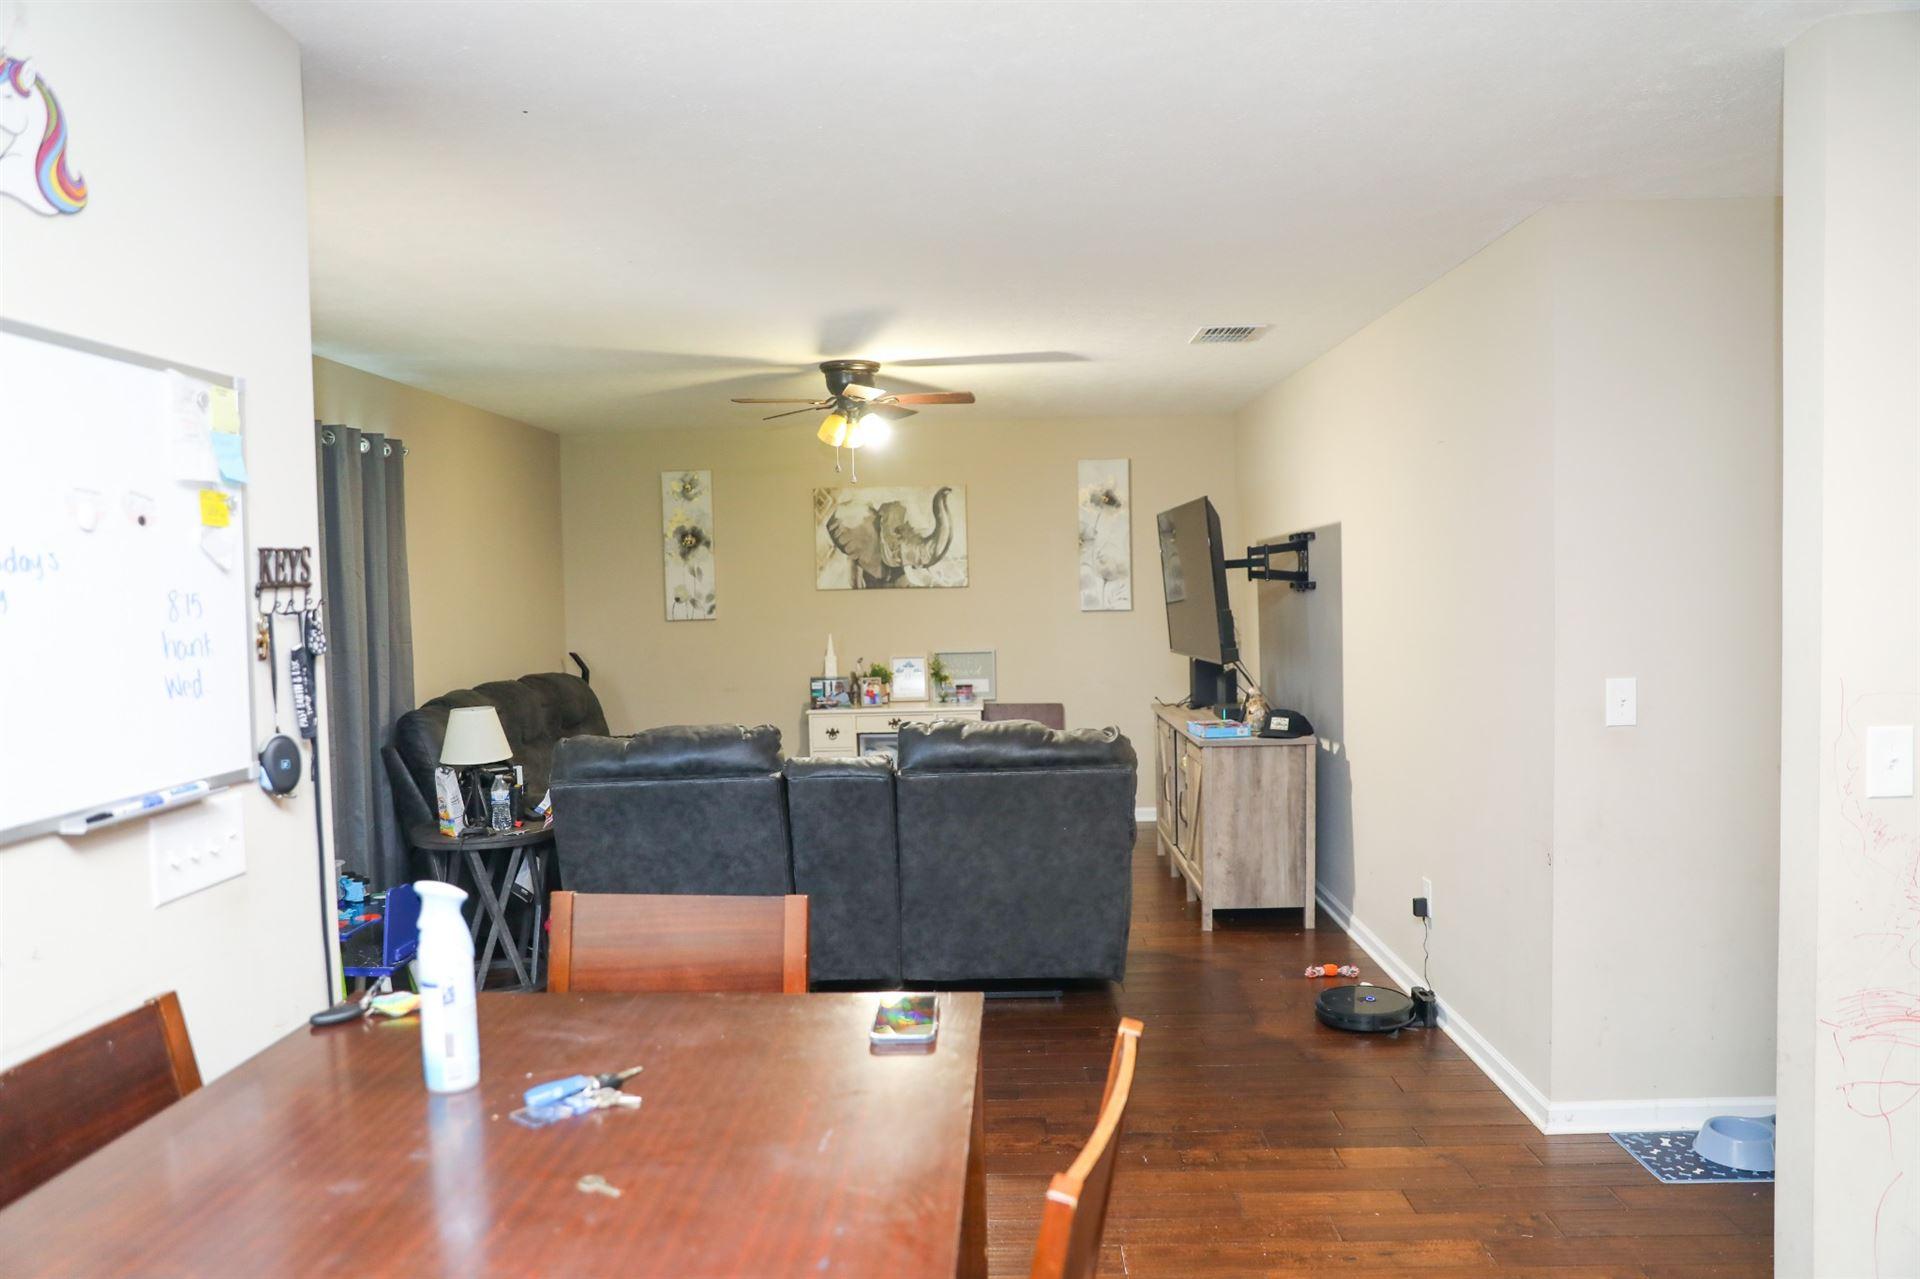 Photo of 111 4th Ave S, Decherd, TN 37324 (MLS # 2293155)